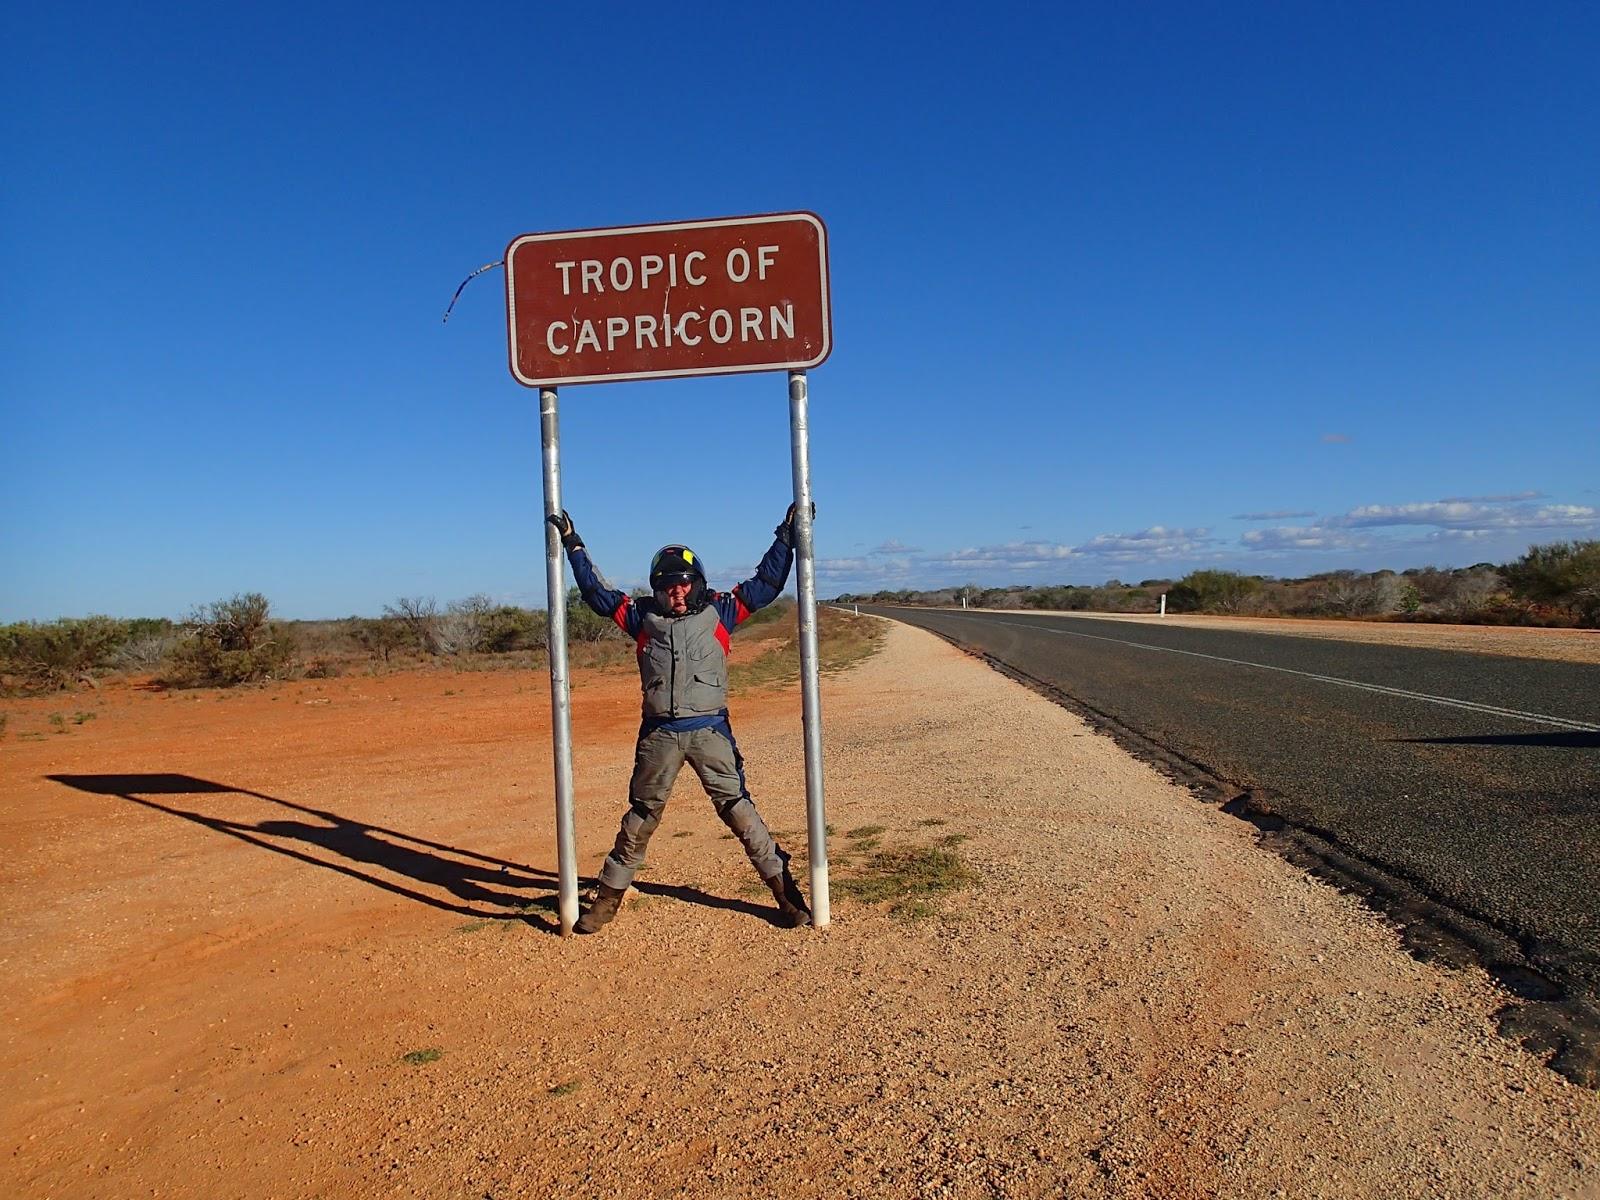 Capricorn date in Australia